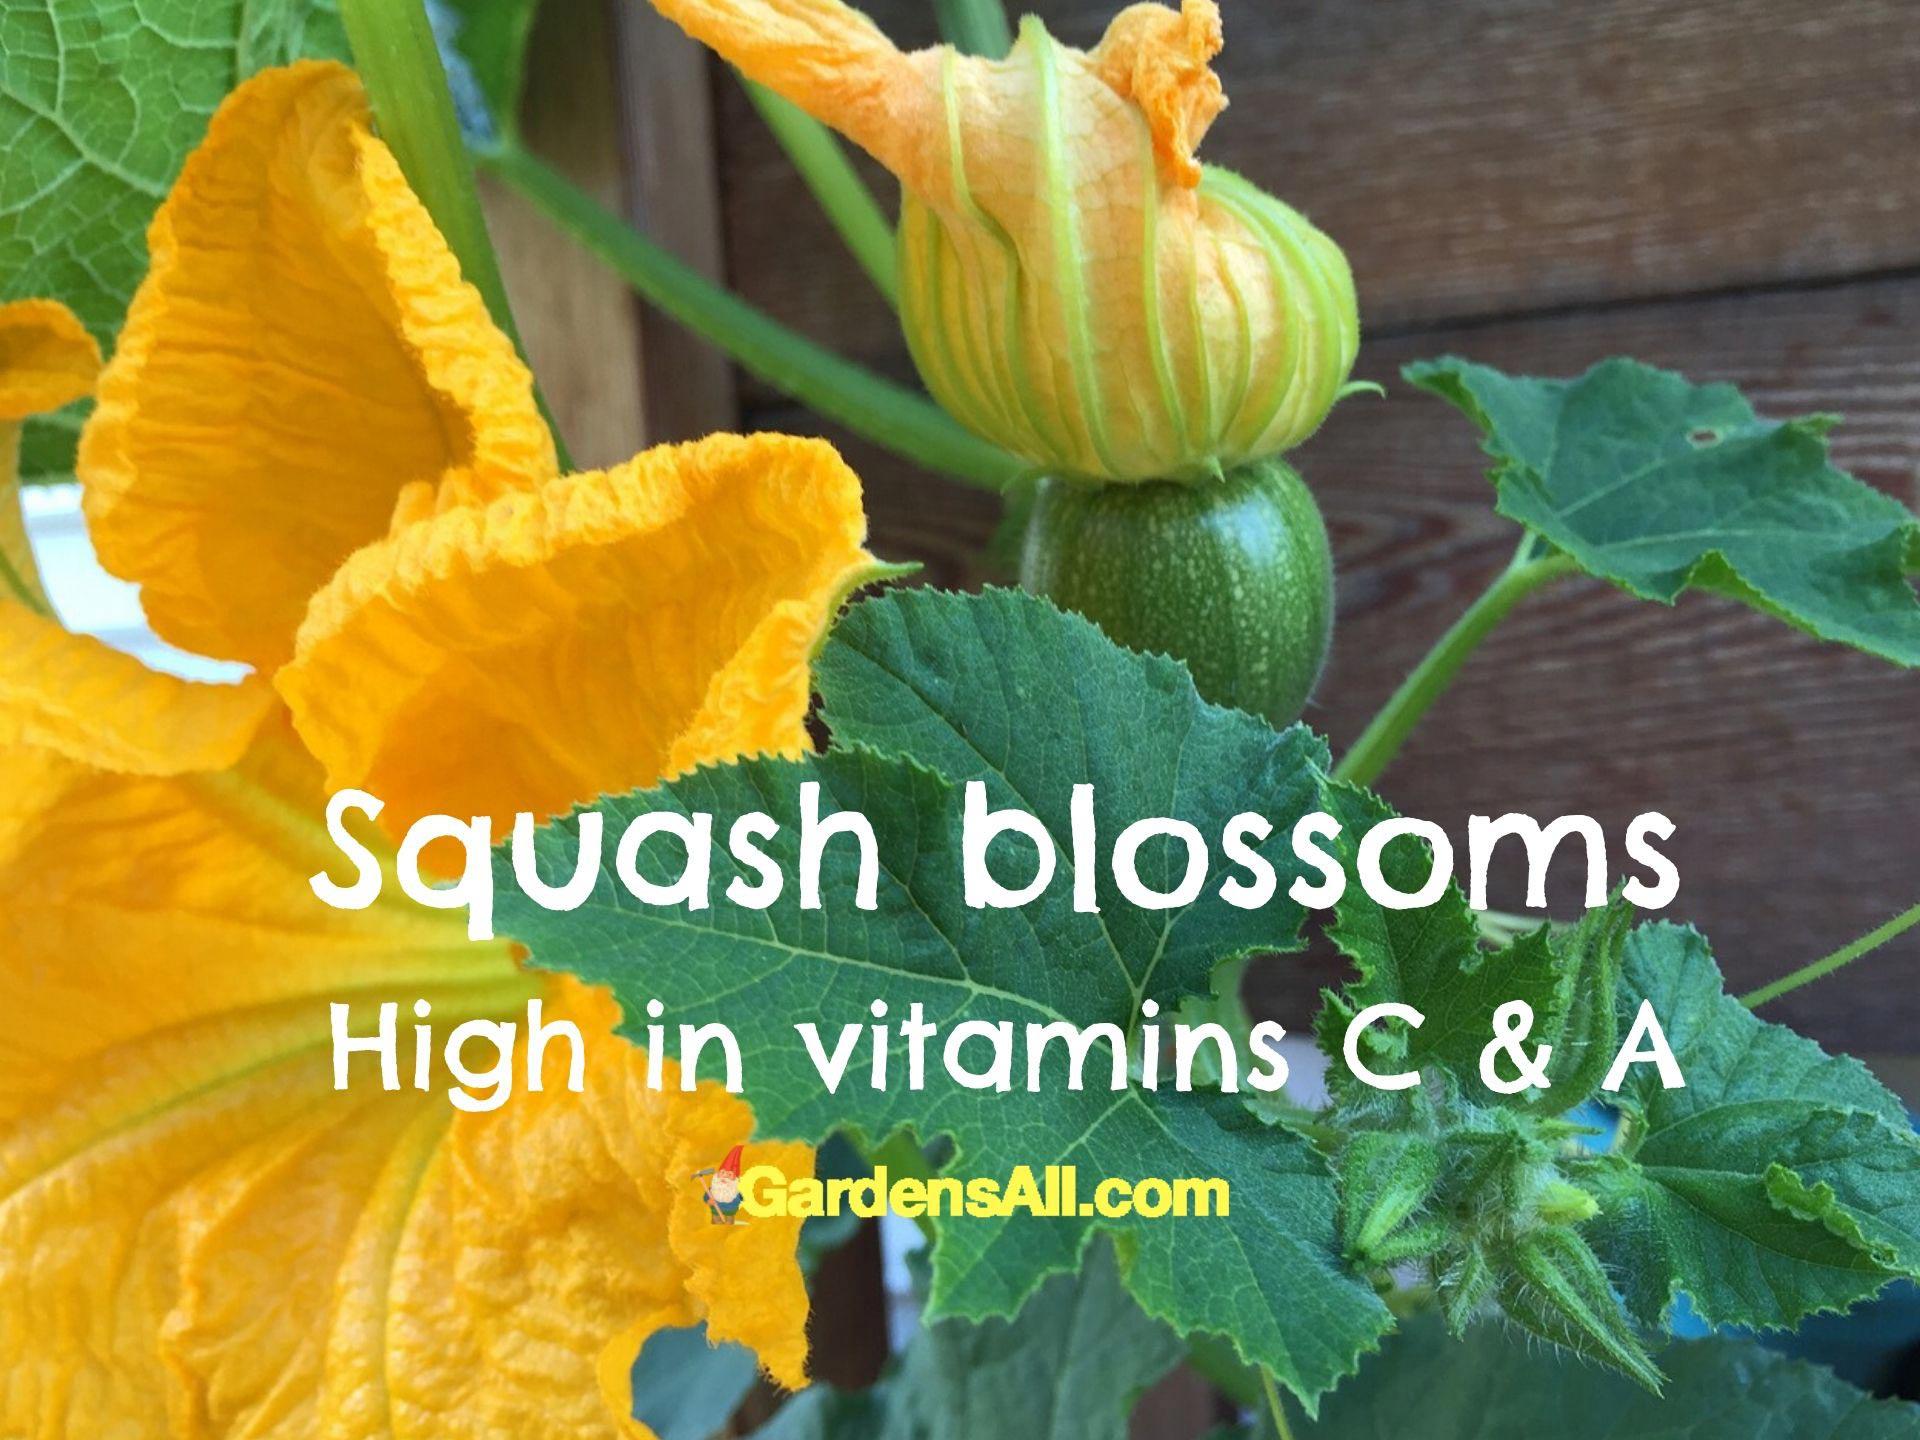 Squash Blossoms are edible flowers #EdibleFlowers #AreFlowersEdible #Flowers #HealthBenefits #Recipes #Edible #Garden